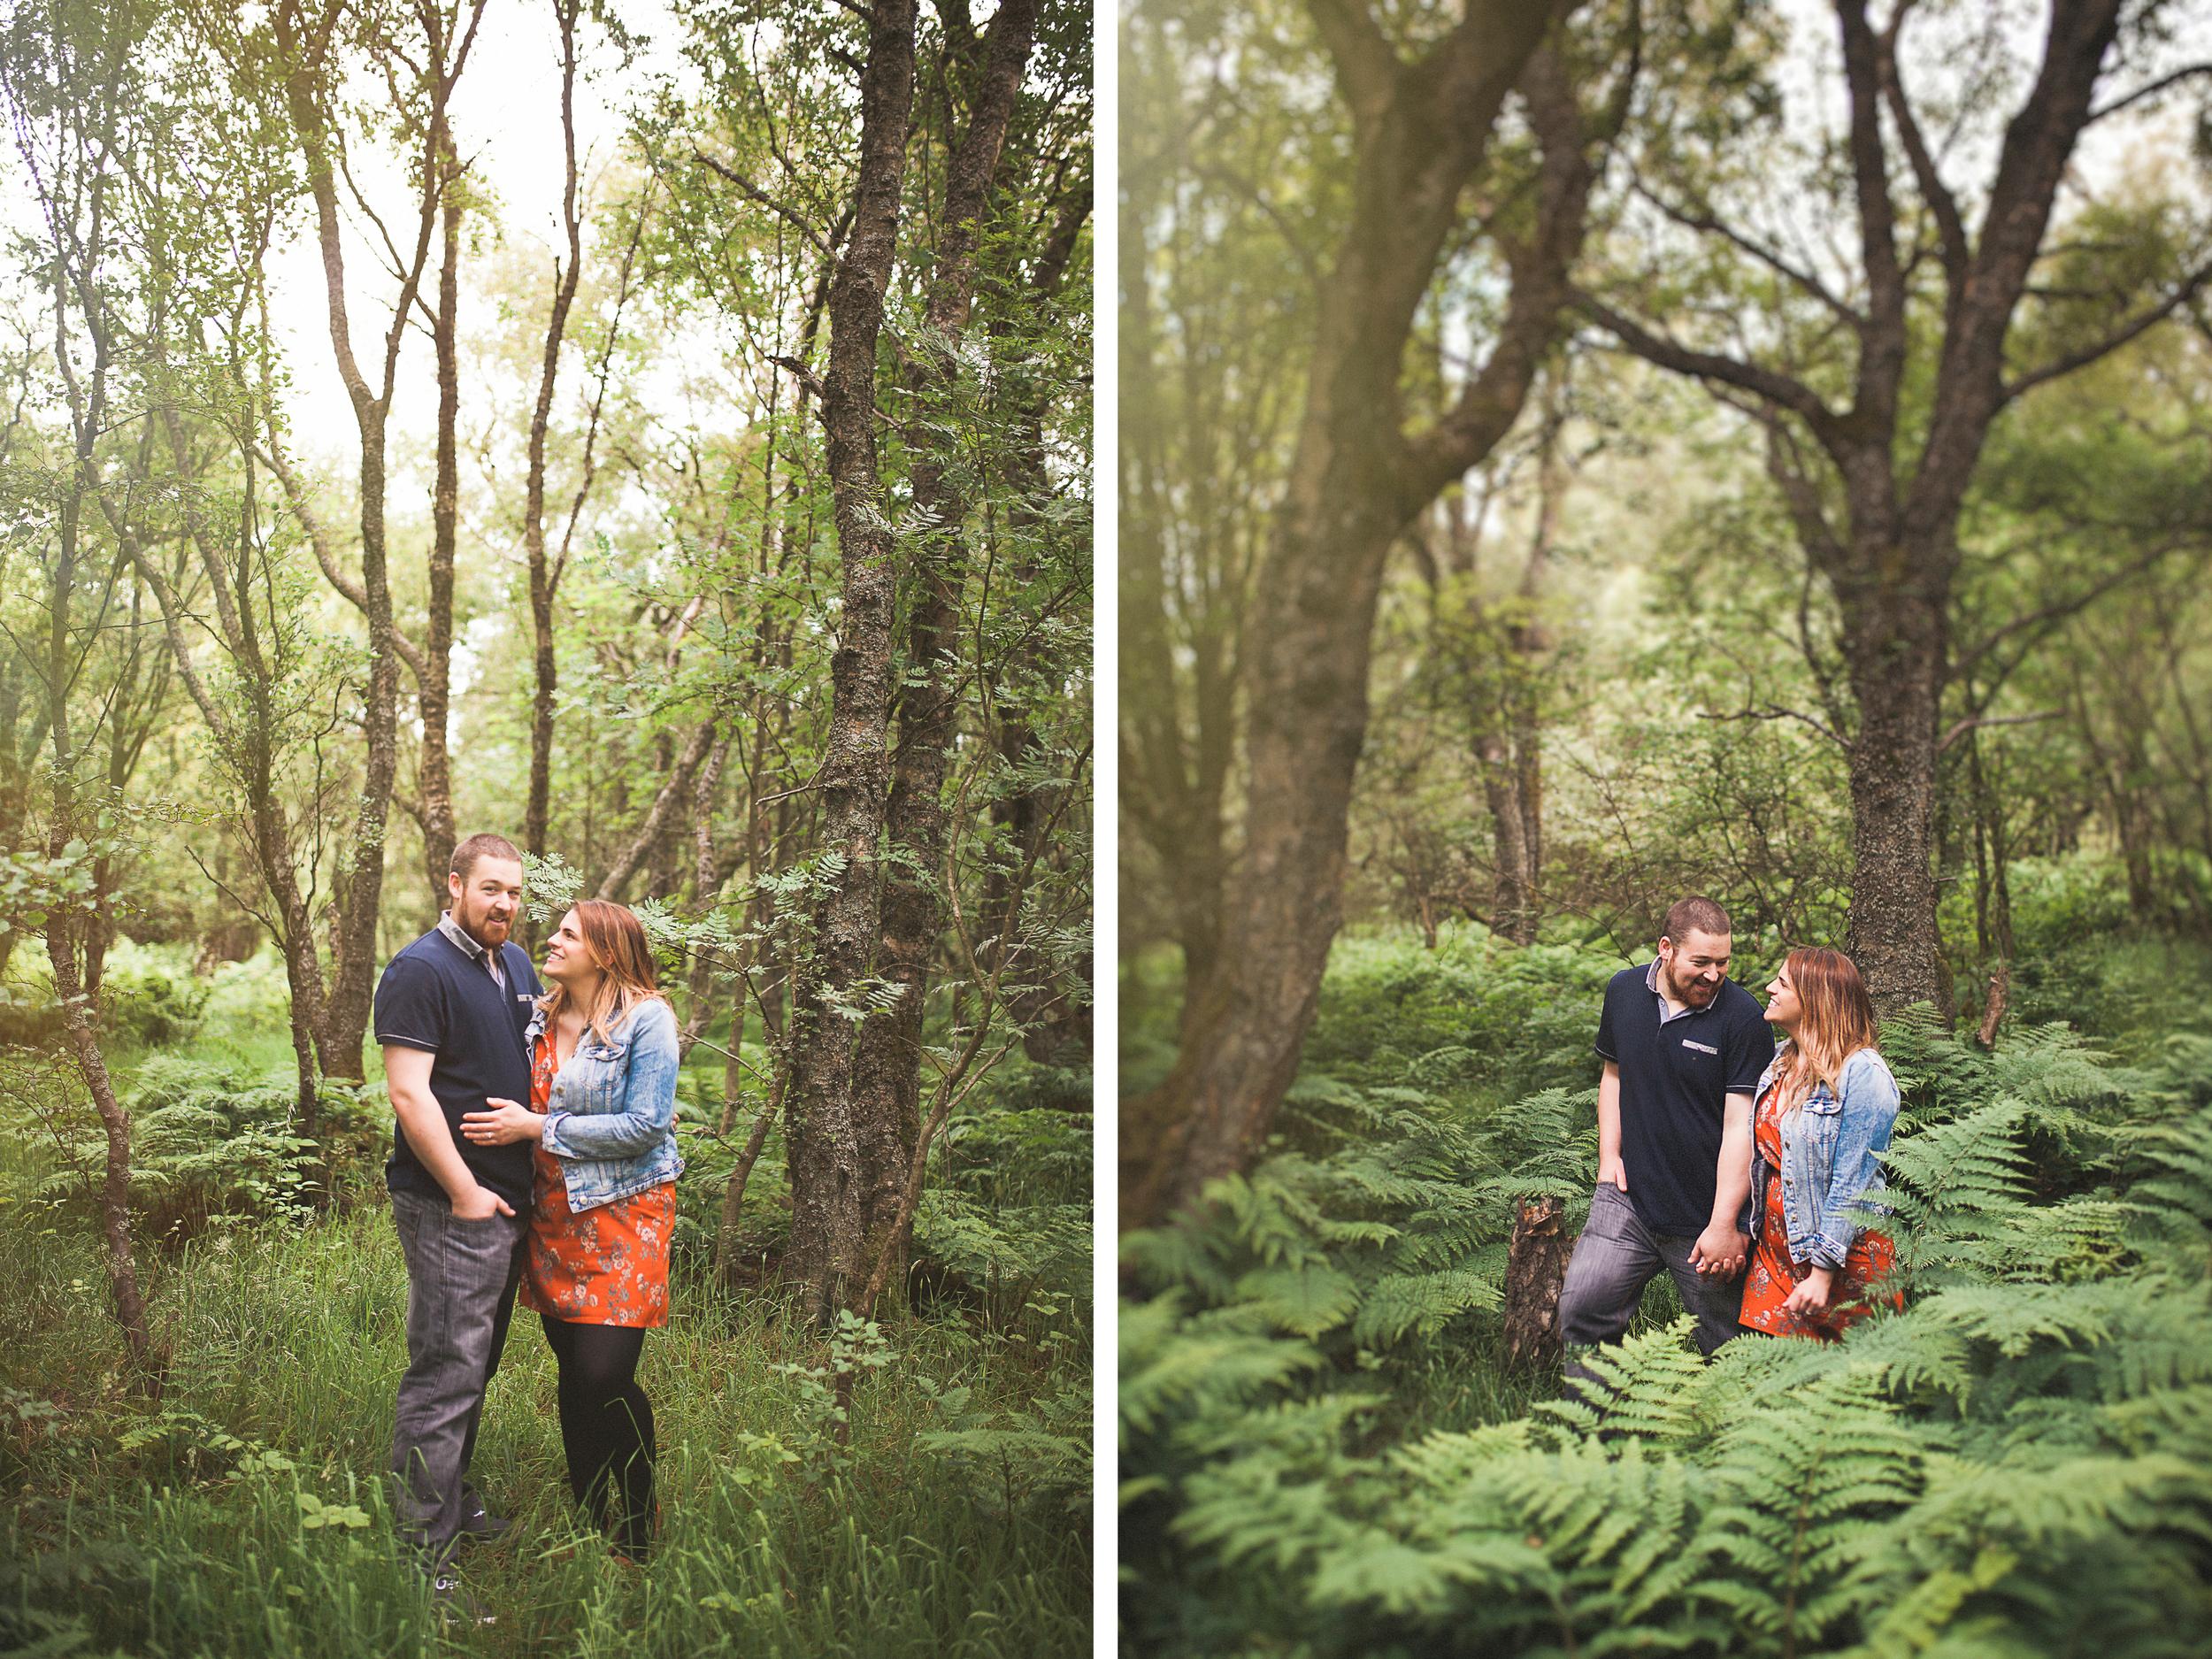 wedding-photographer-edinburgh-scotland-engagement-elopement-09.jpg